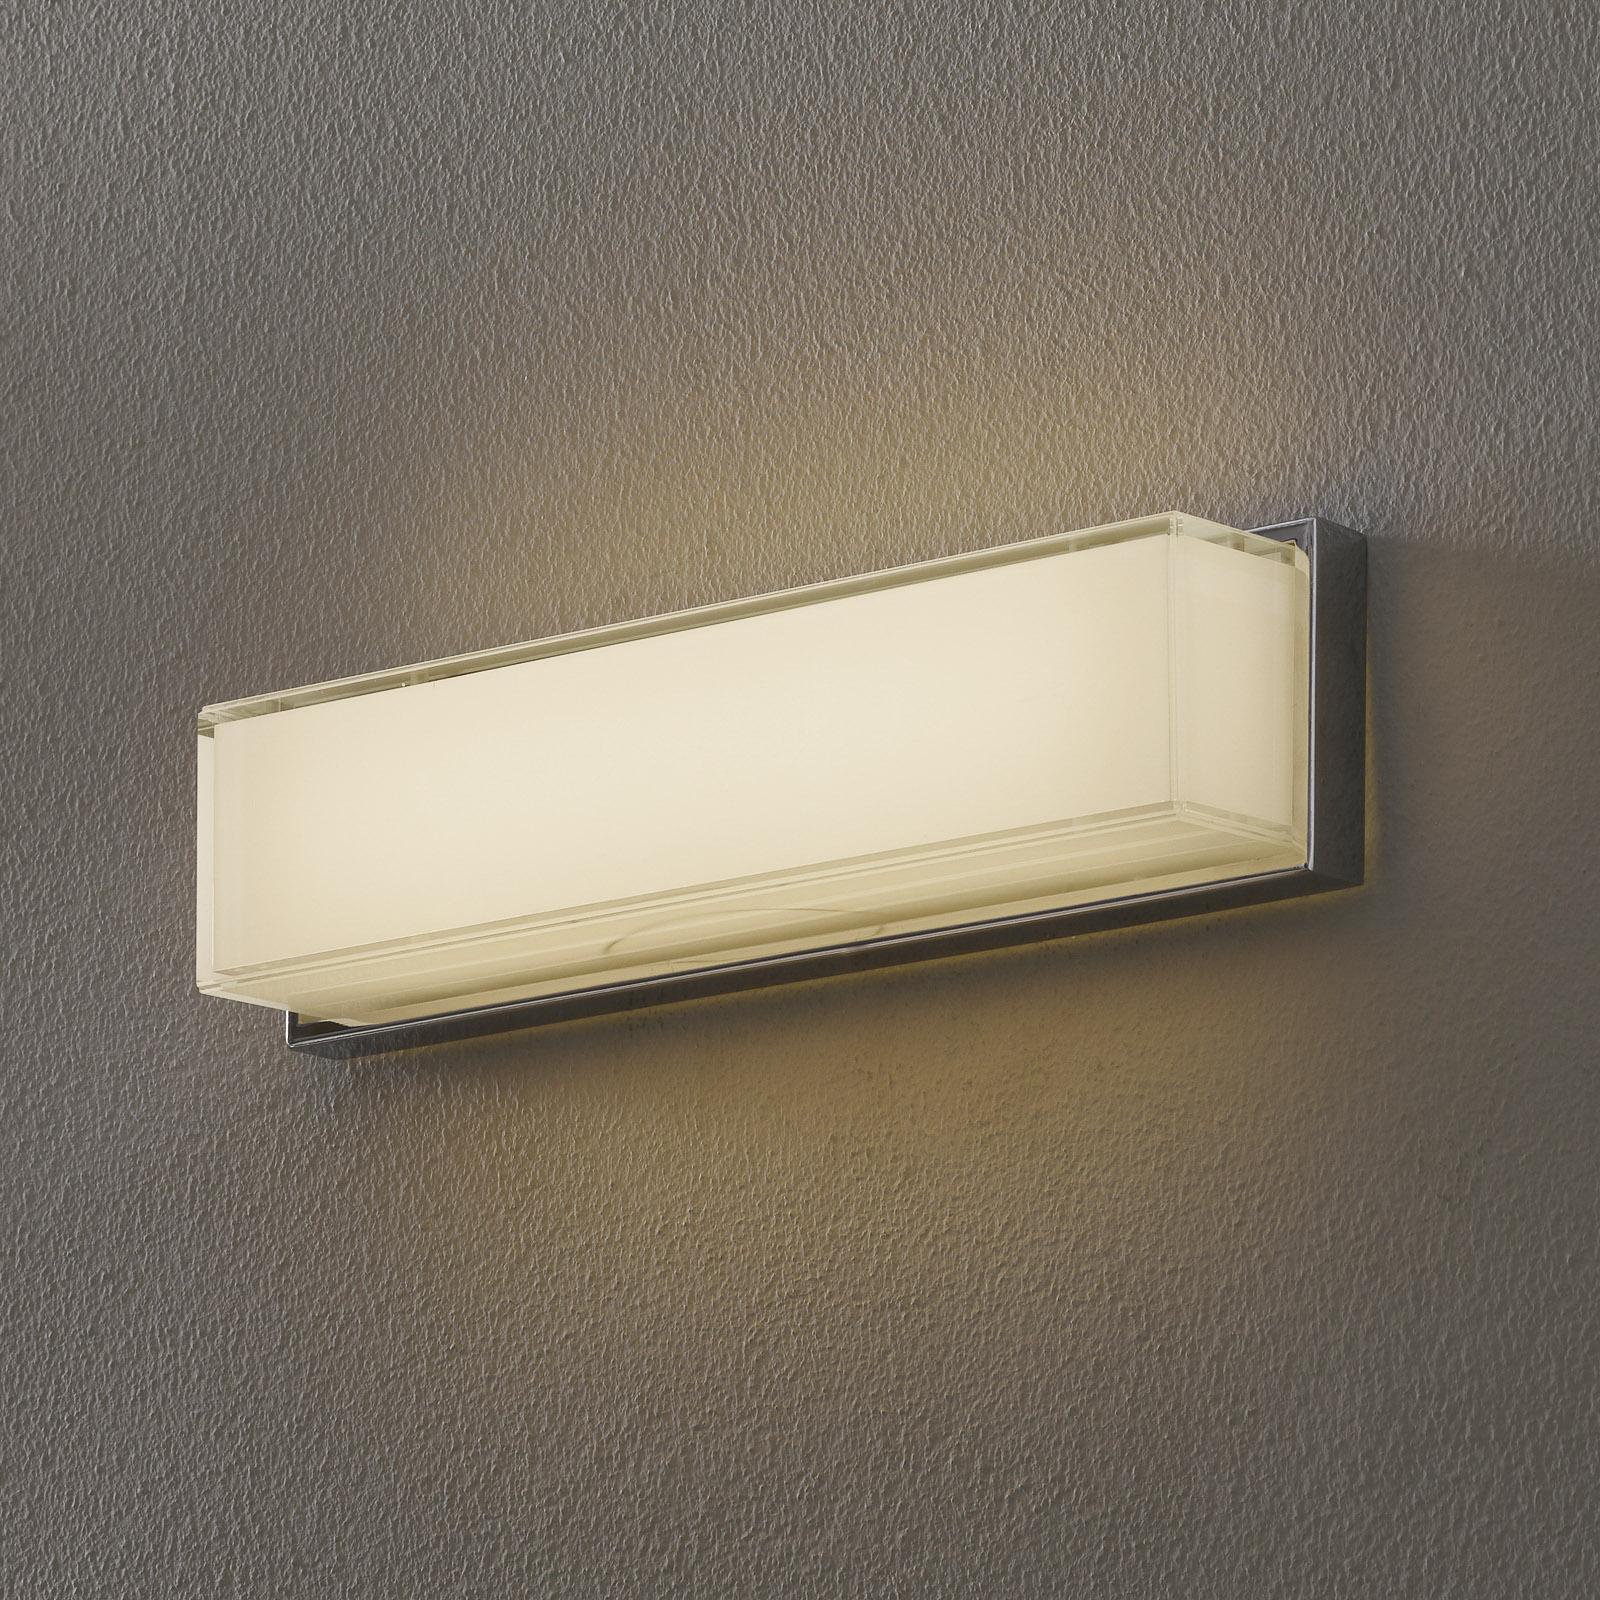 Helestra Cosi applique LED cromo altezza 31 cm